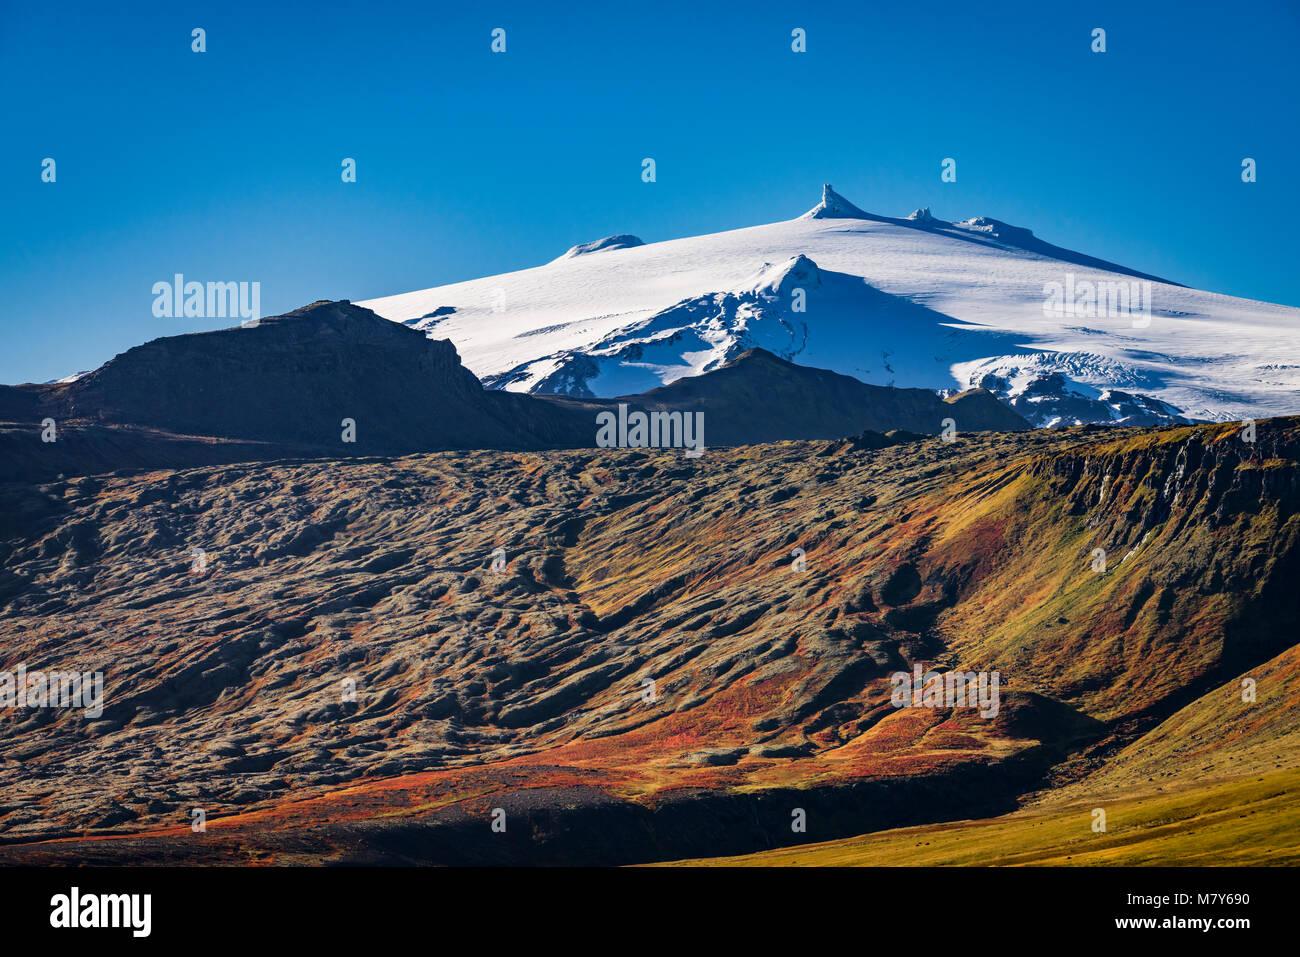 Ghiacciaio Snaefellsjokull, in autunno, Islanda Immagini Stock